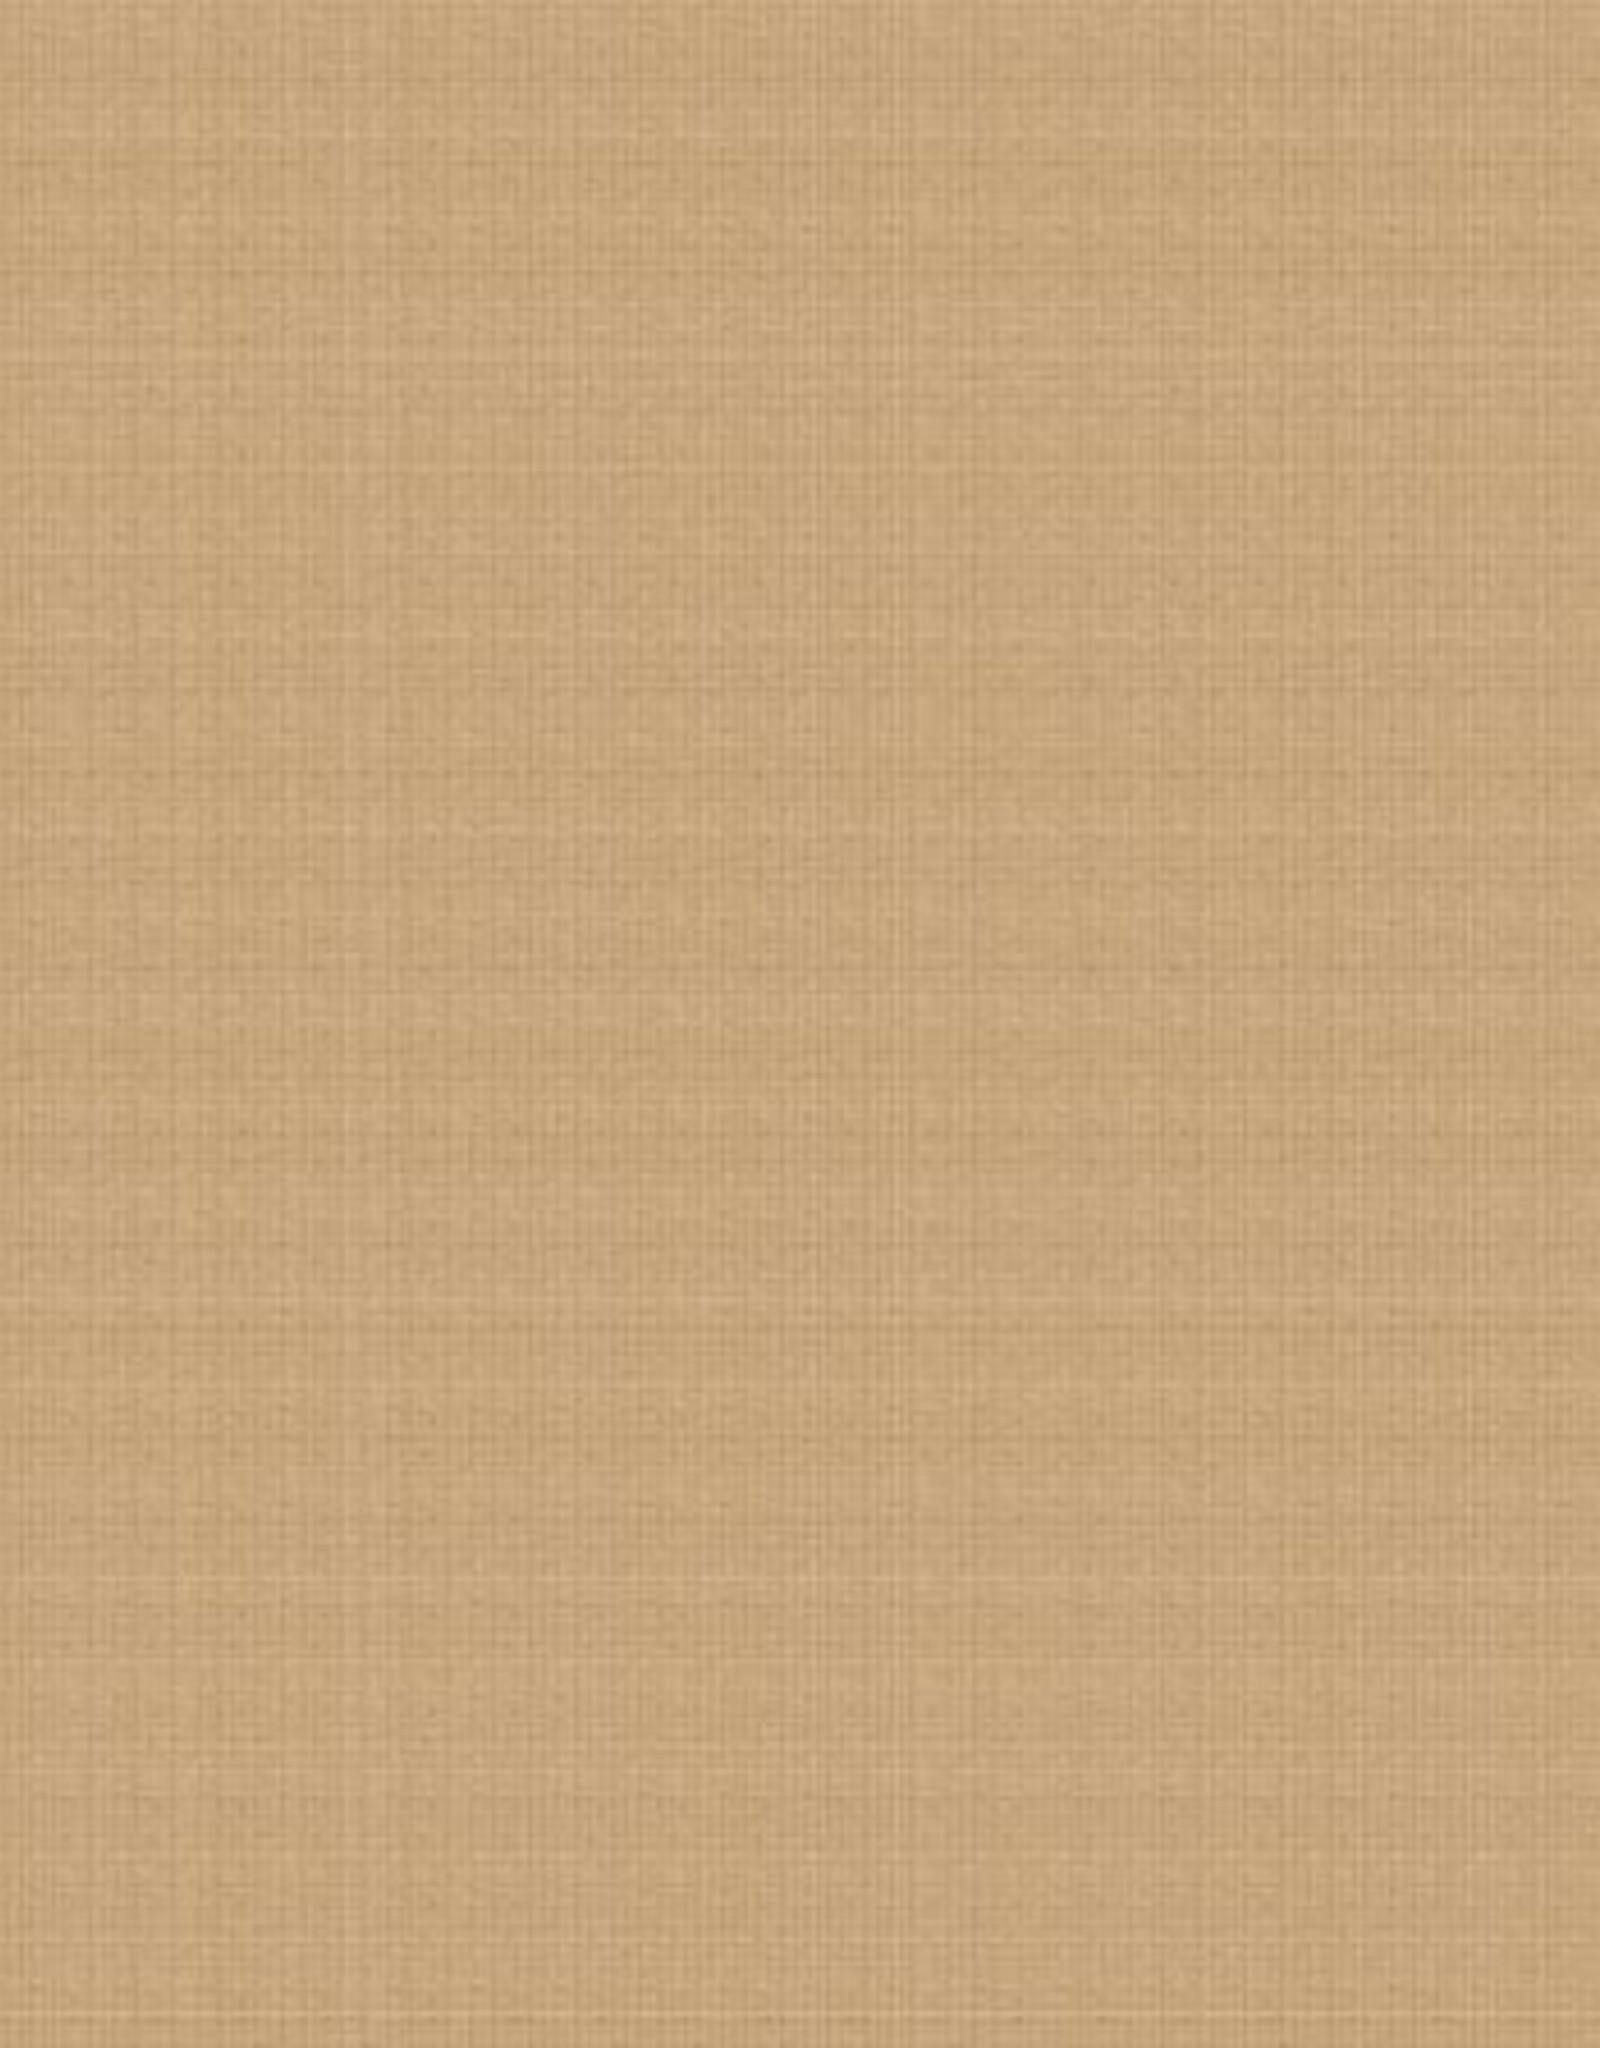 Westfalenstoffe AG 10 cm Uni beige W4008650